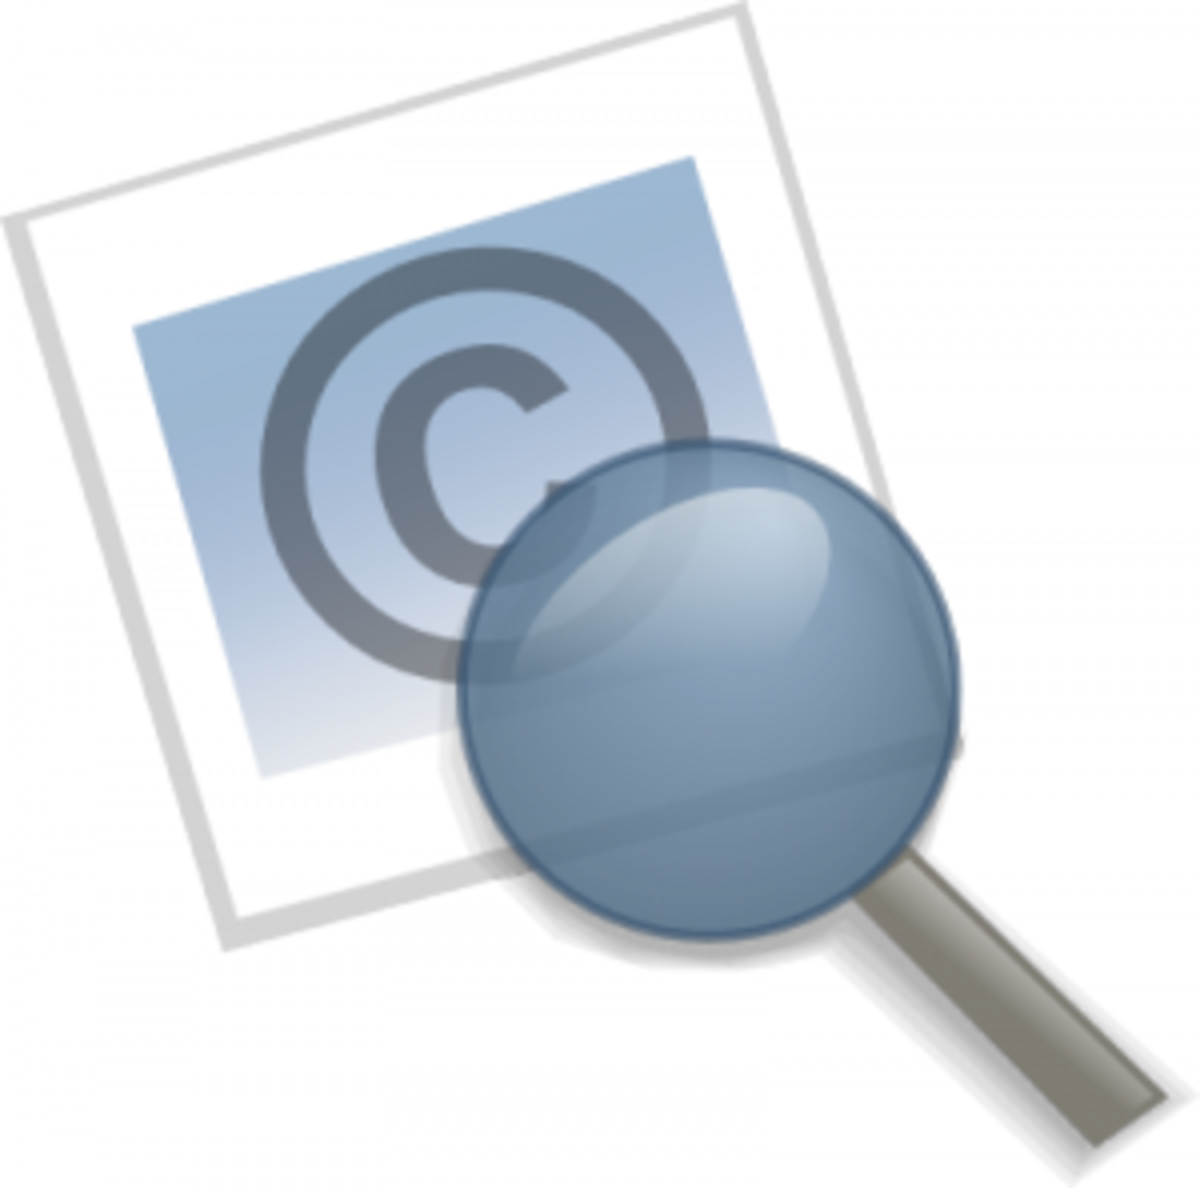 oeb-copyright-image